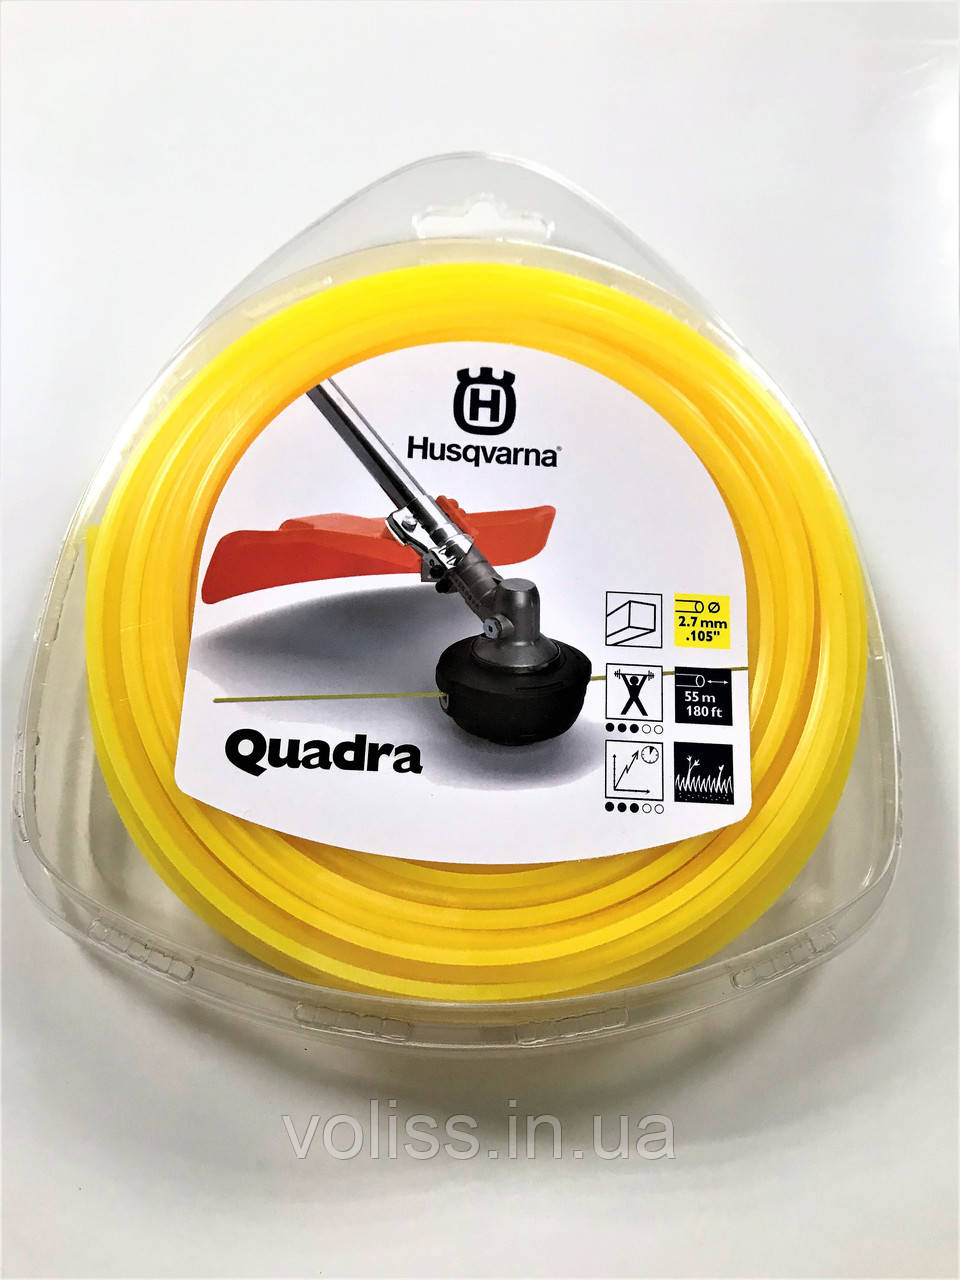 Косильная леска (корд) квадратная  Husqvarna 2,7мм/55м Quadra